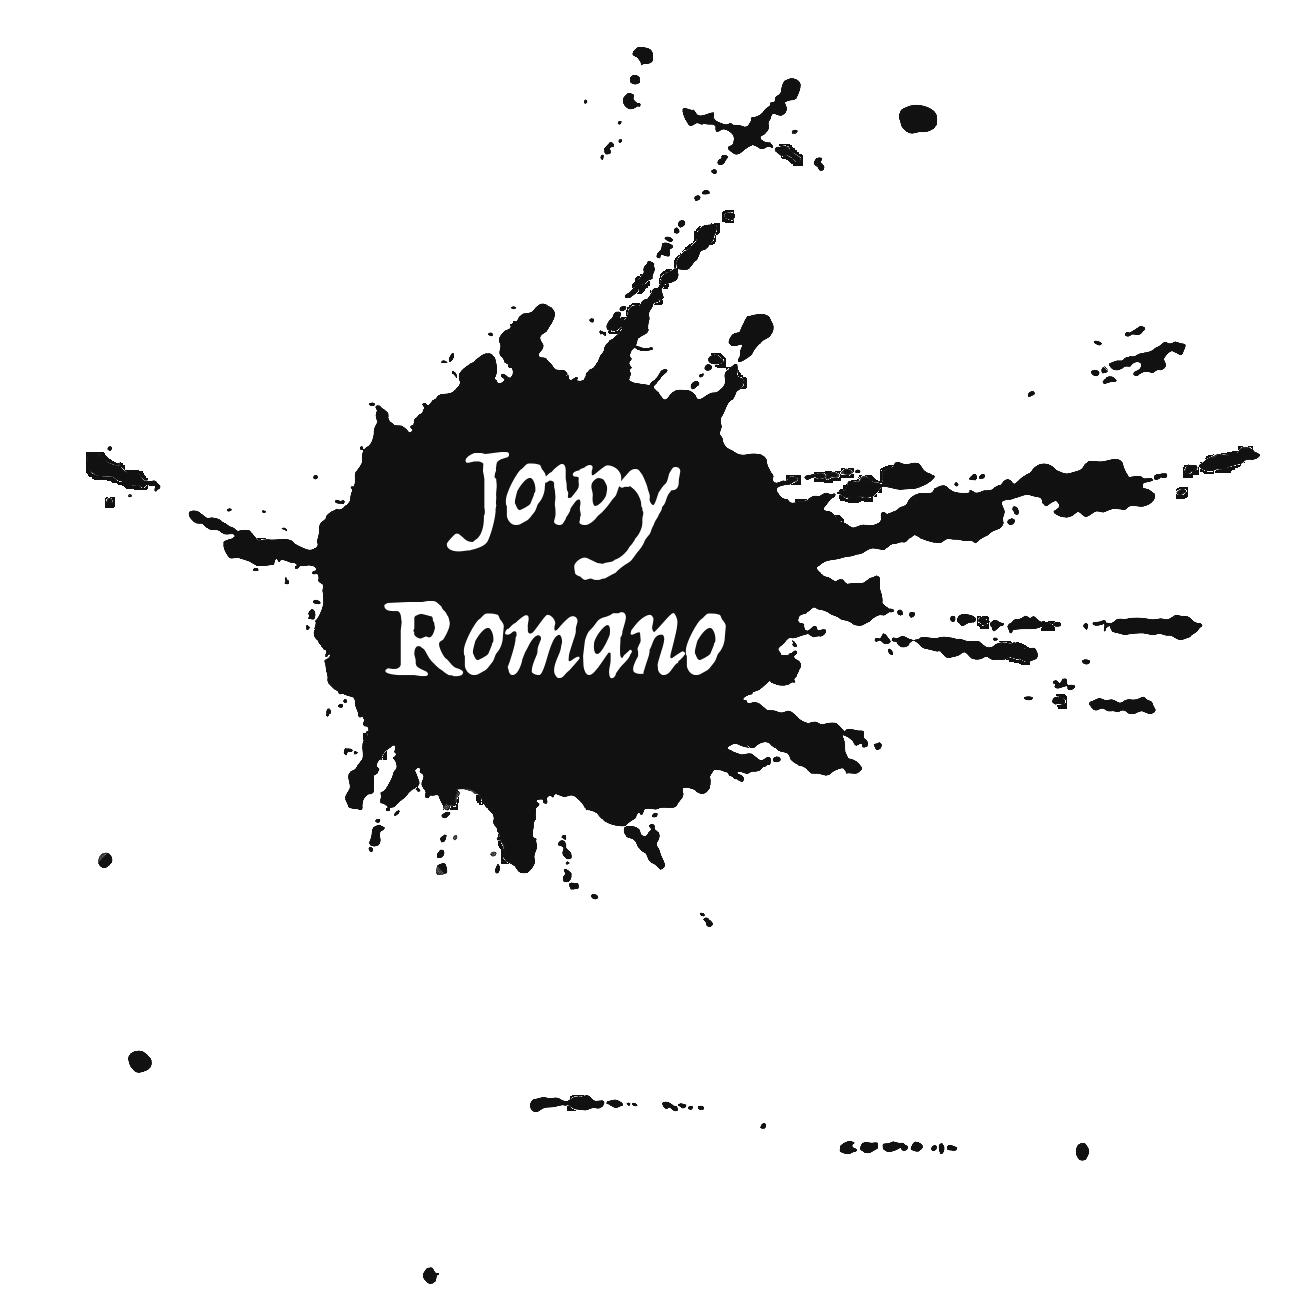 Jowy romano 1betcityfo Gallery